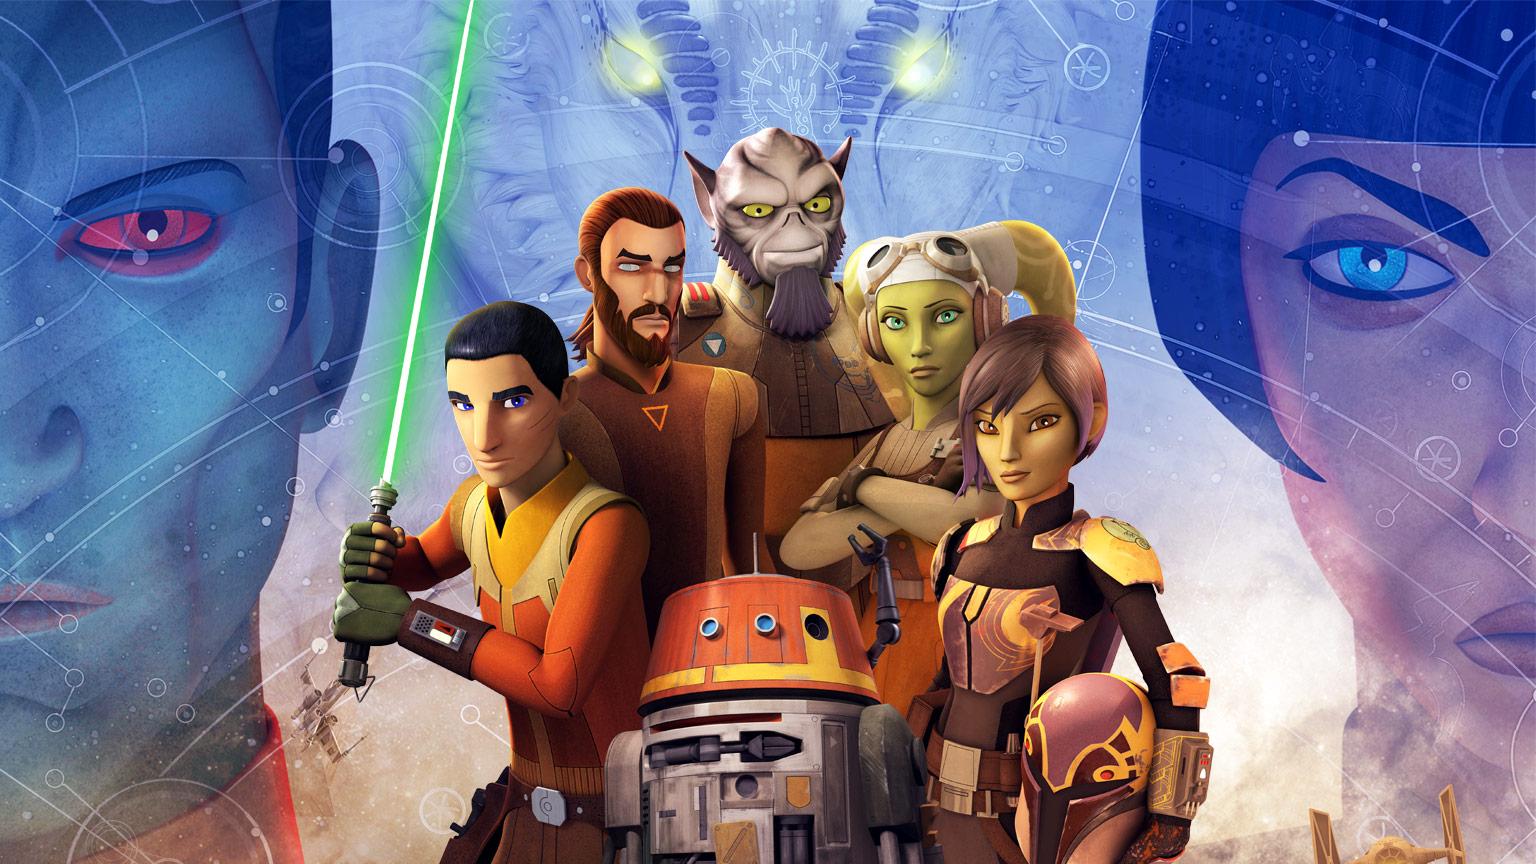 Star Wars Rebels 1536x864 Download Hd Wallpaper Wallpapertip